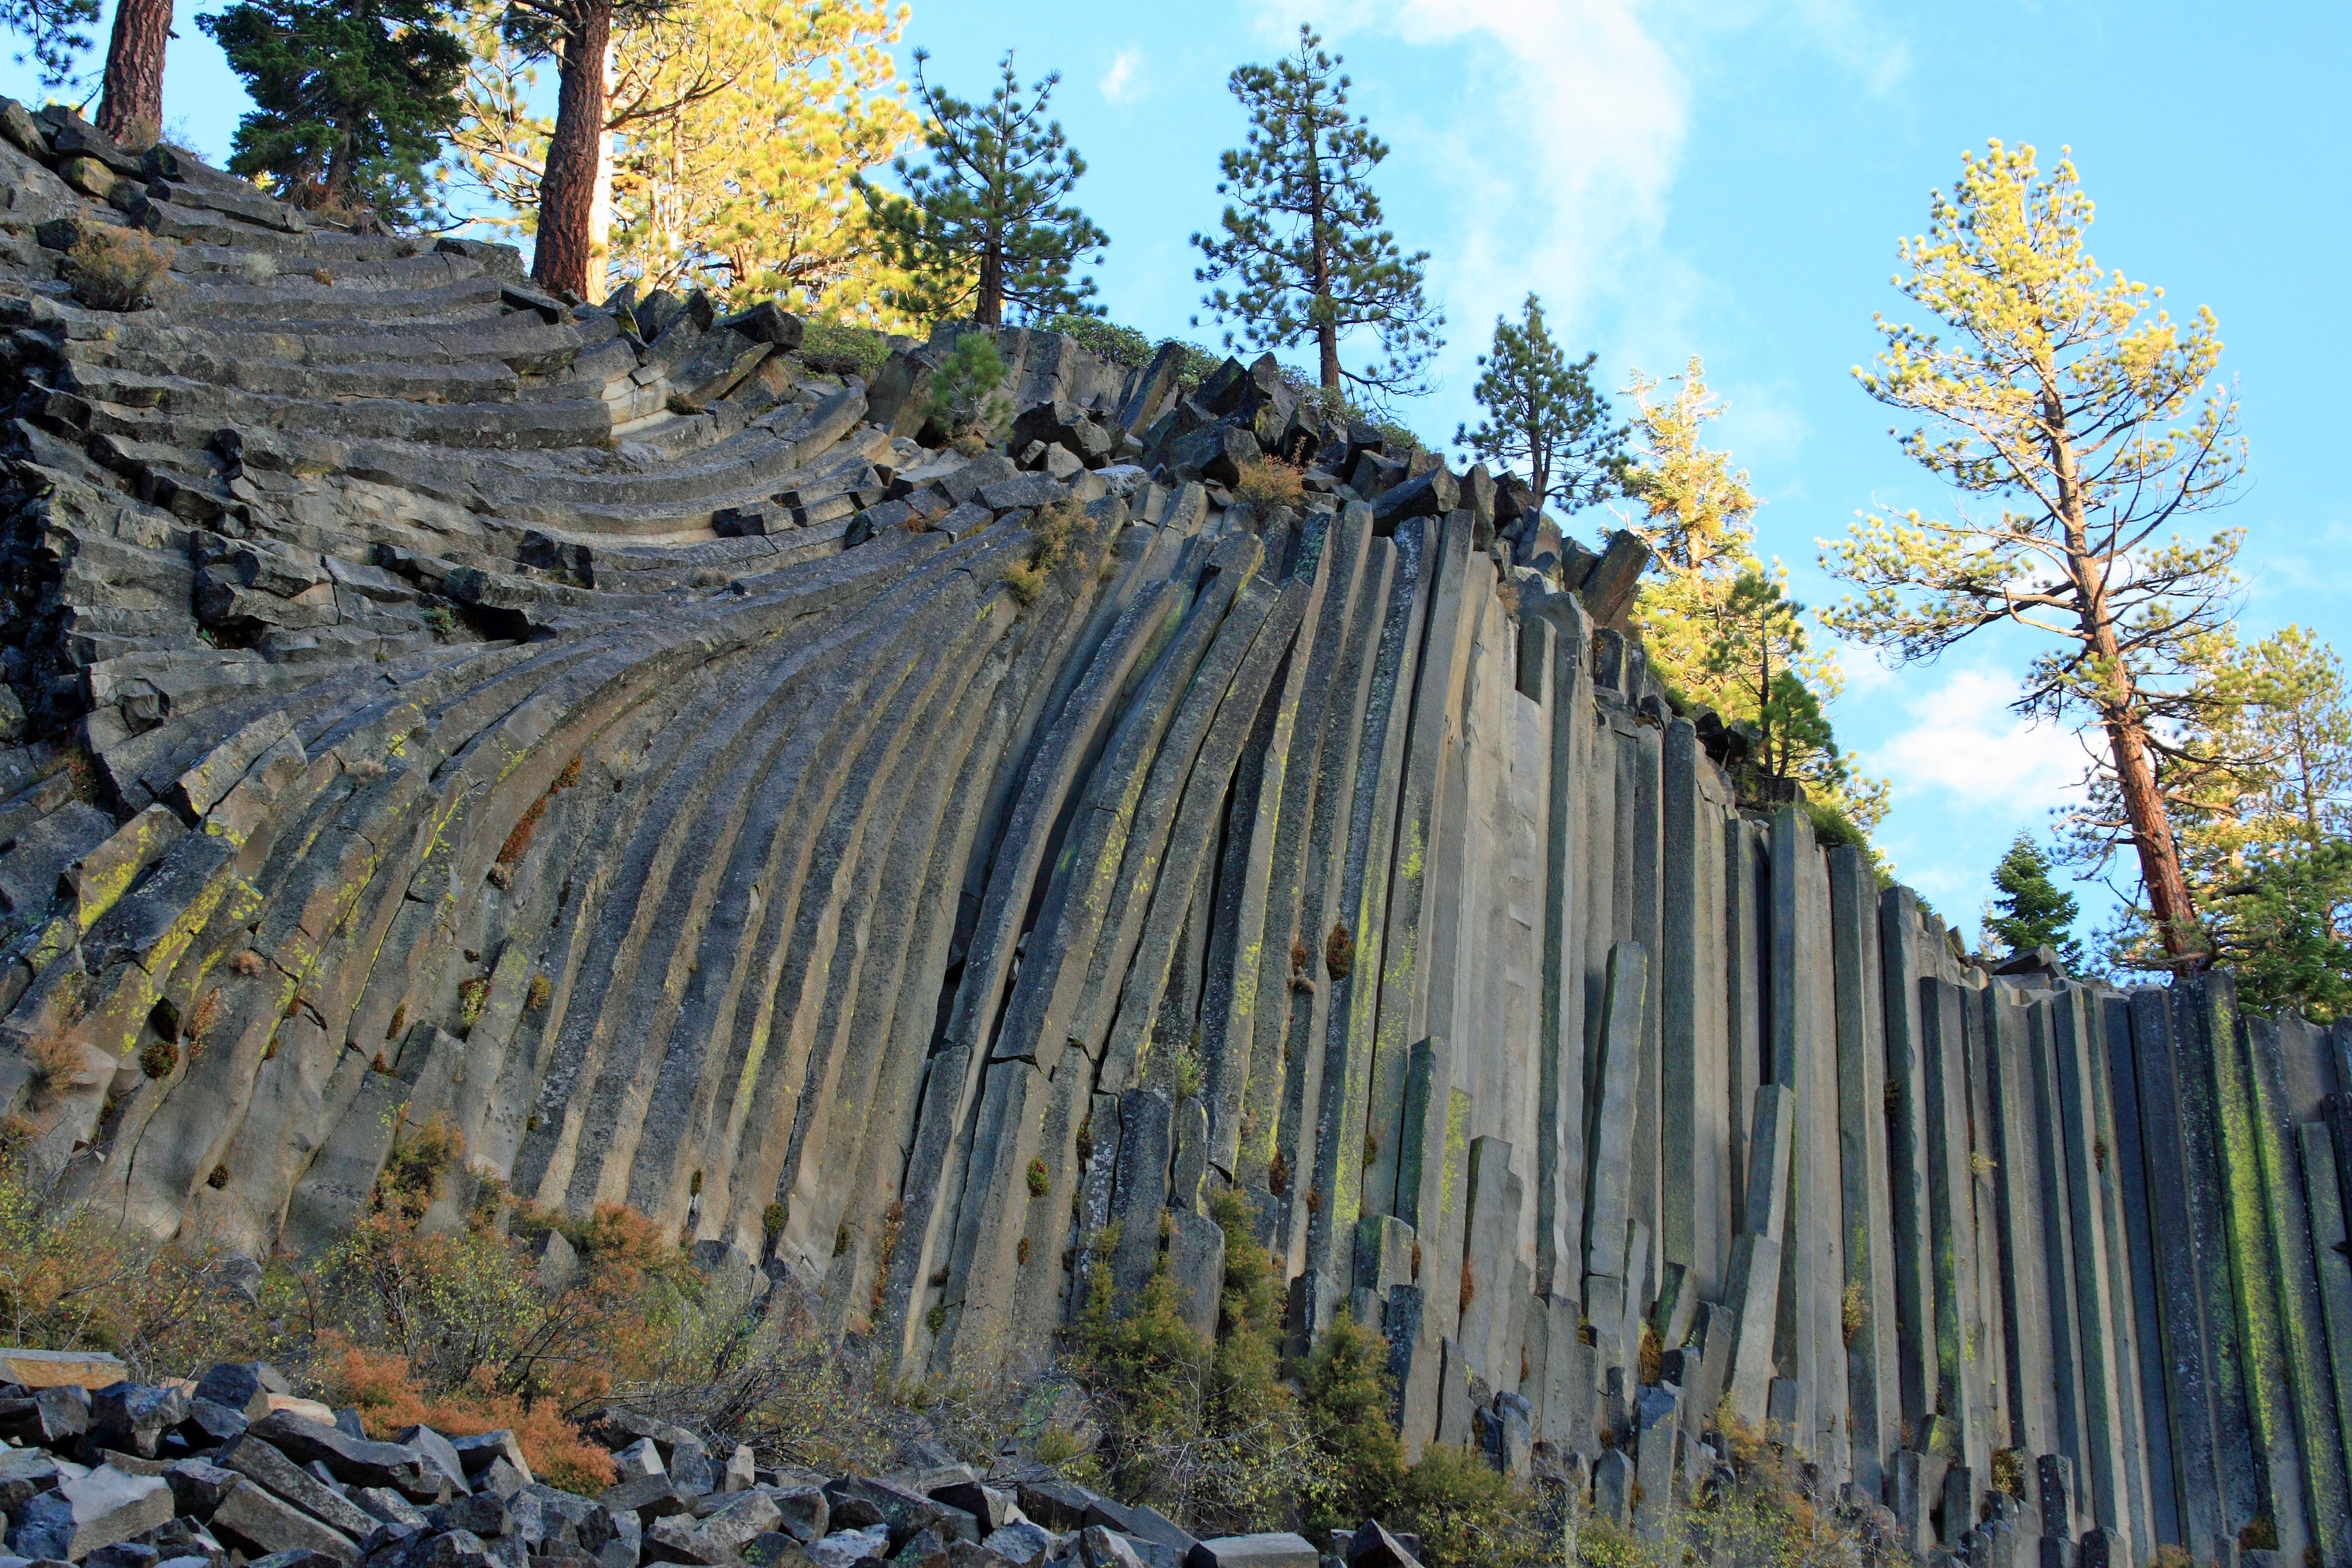 File:Devils Postpile National Monument near Mammoth Lakes.jpg